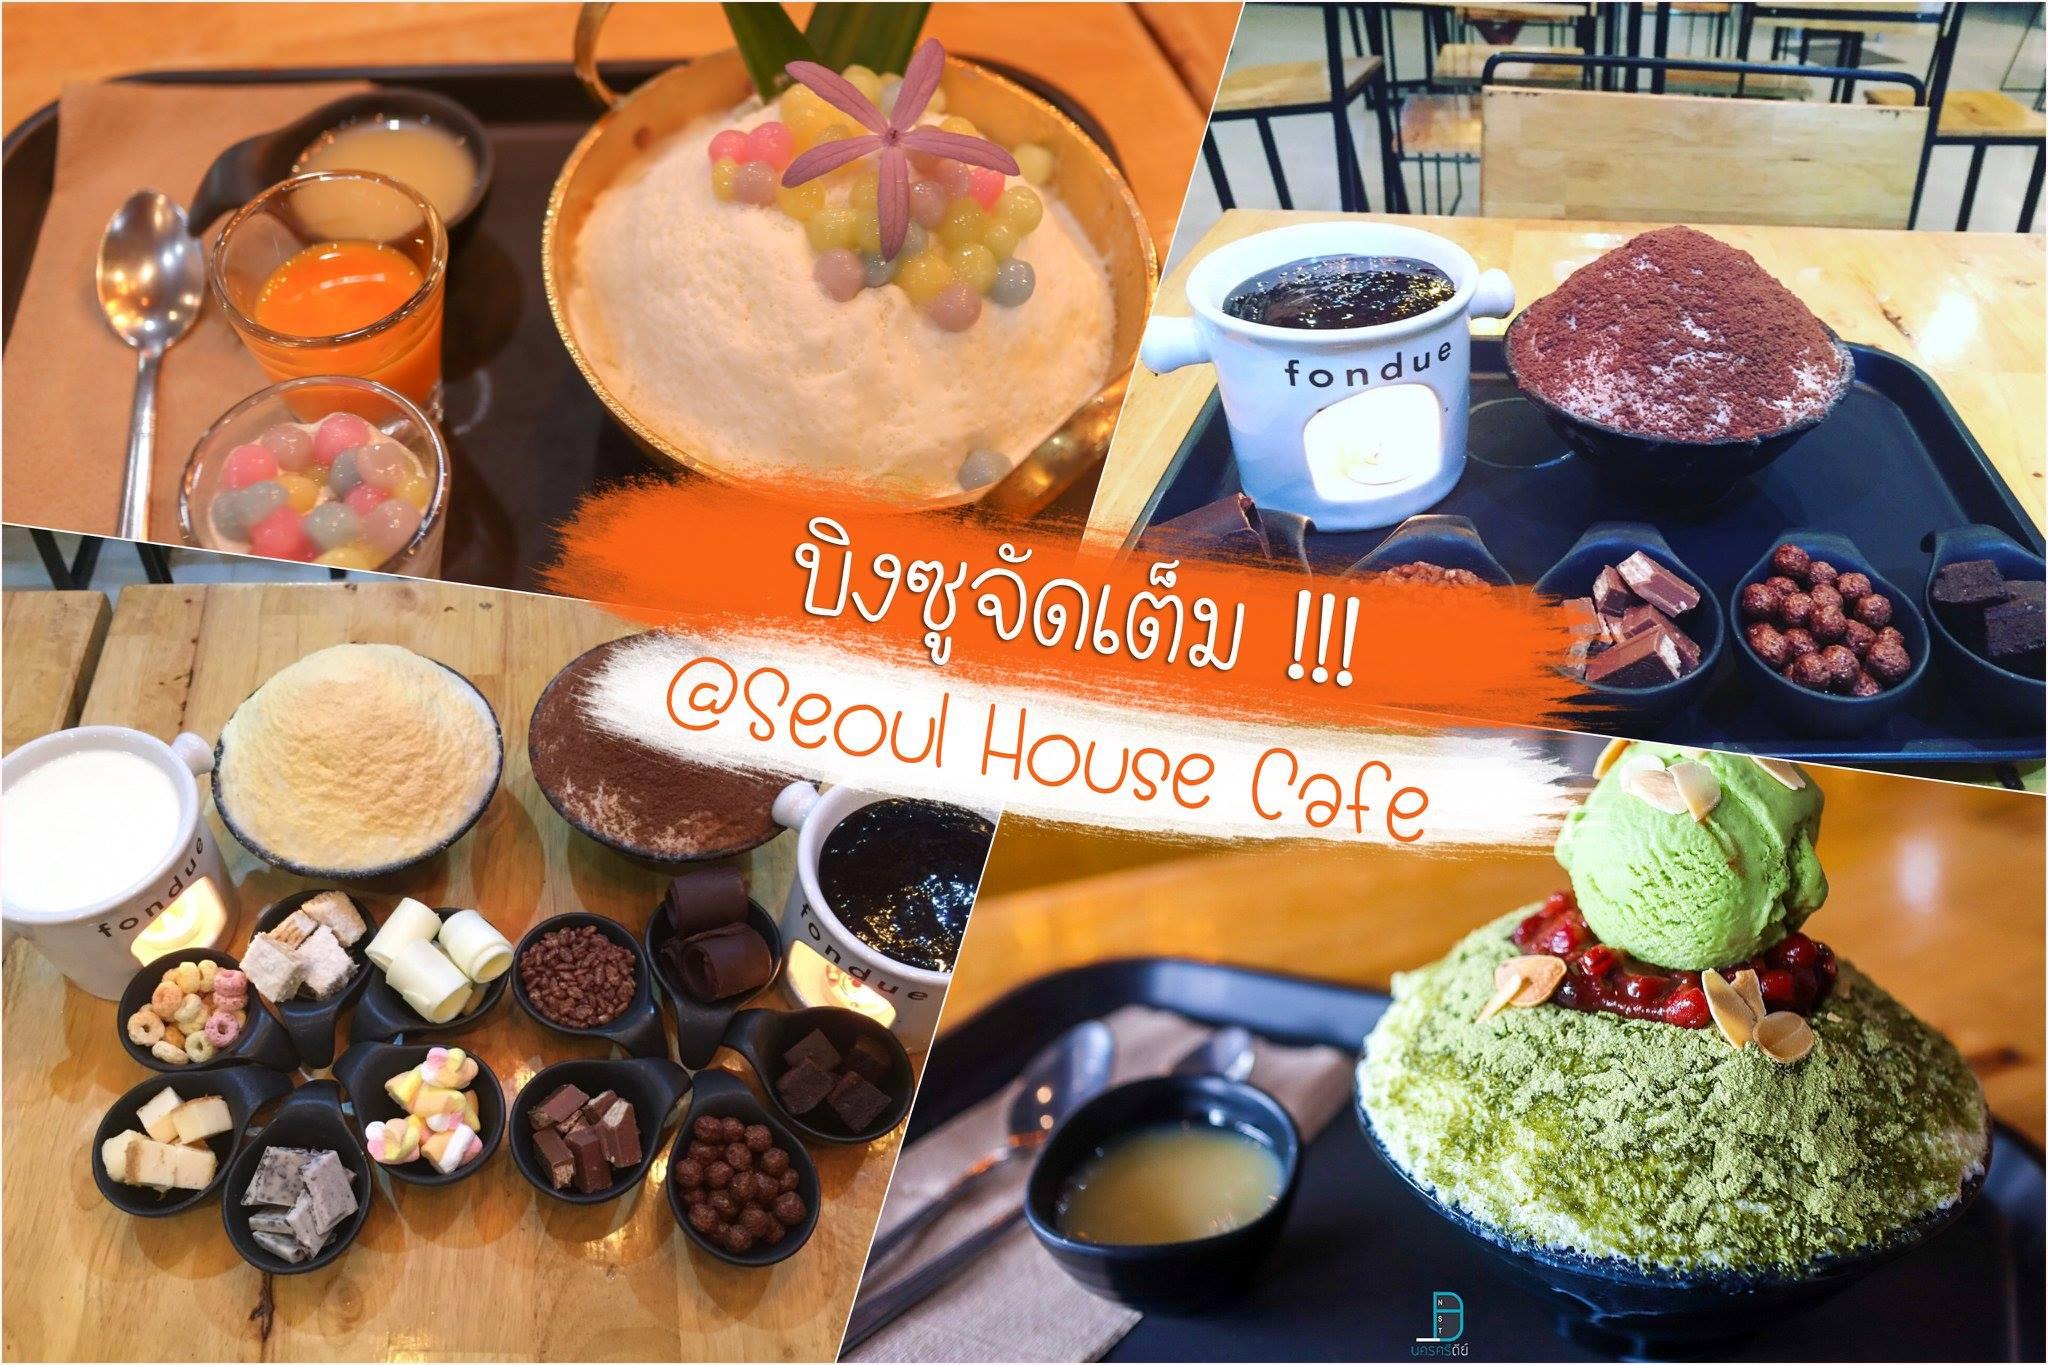 5.-Seoul-House-Dessert-Cafe ร้านนี้บอกเลยมีทั้งอาหารเกาหลีขายและบิงซูครับ-วันนี้เราจะเน้นบิงซูกันบอกเลยเมนูใหม่บัวลอยเด็ดมากกกก-รสชาติอร่อยกำลังพอดีครับมีบัวลอยมีงาดำด้านล่างครับ-และเมนูอื่นๆพวกชอกโกแลตชาเขียวก็เด็ดครับ-และเมนูอีกมากมายลองไปชิมกันดูนะครับ พิกัด-:-หลังแมค Seoul-House:-dessert-cafe?-craftbeer-นครศรีฯ คาเฟ่,นครศรีธรรมราช,2021,จุดกิน,ของกิน,วิวหลักล้าน,ร้านกาแฟ